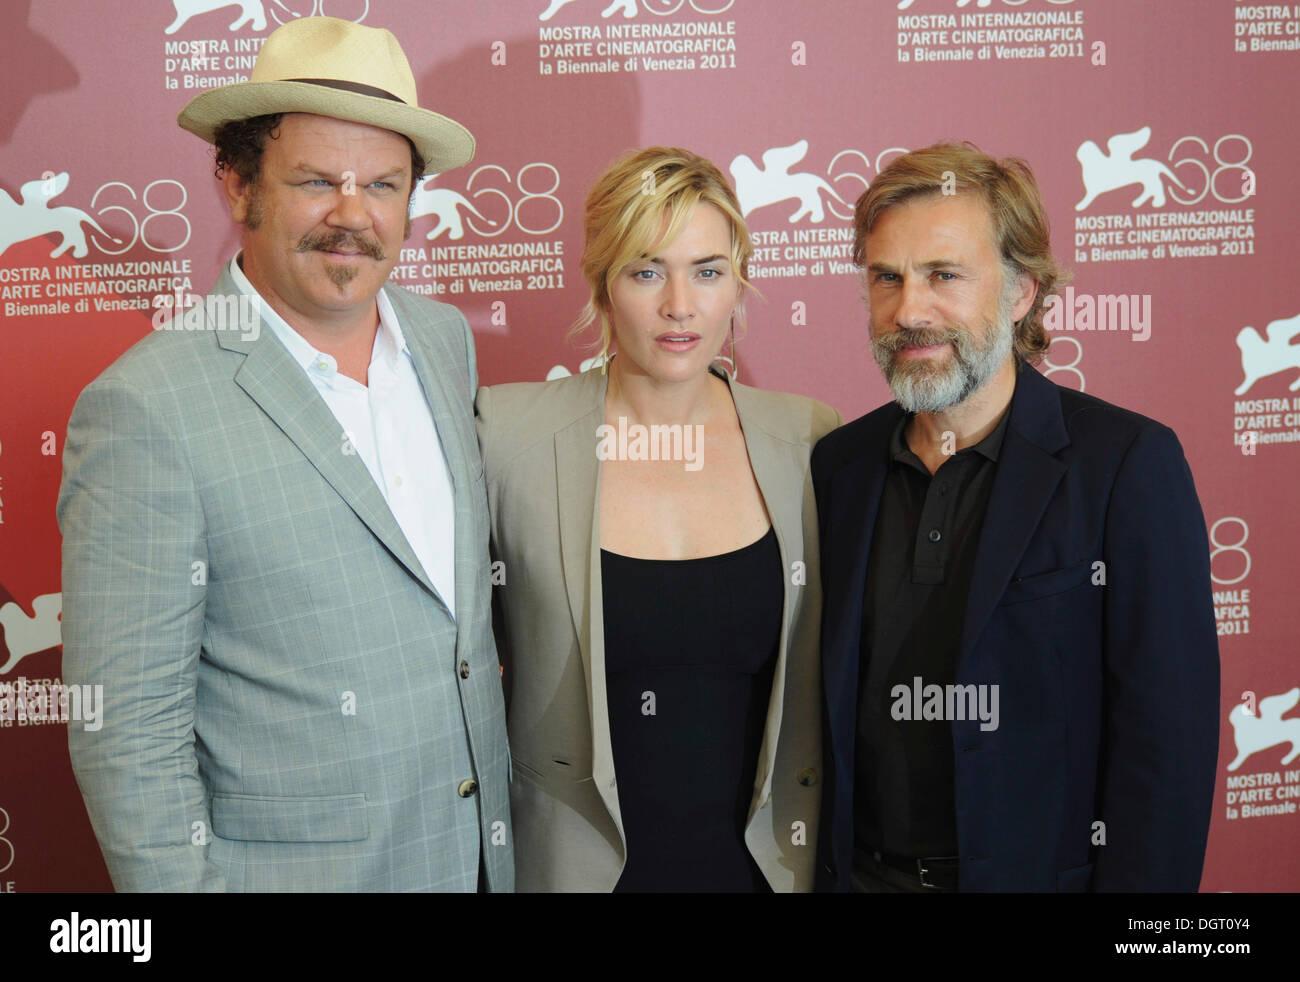 John C Reilly, Kate Winslet e Christoph Waltz frequentando un photocall per il film Carnage, 68esimo Festival Internazionale Foto Stock